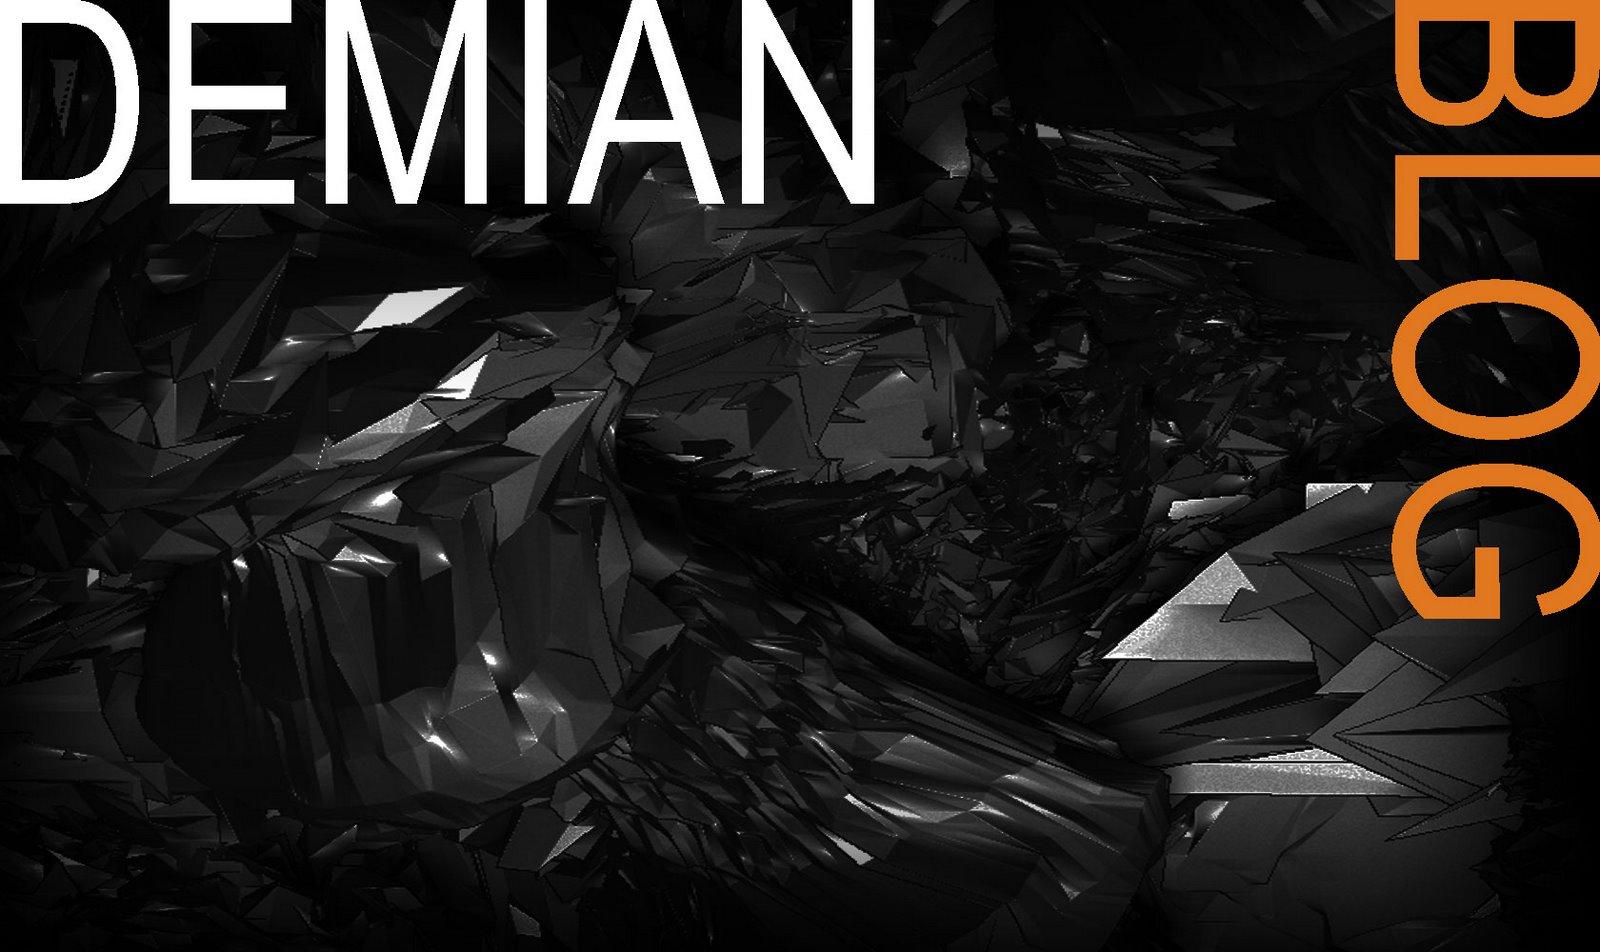 //Demian's work blog